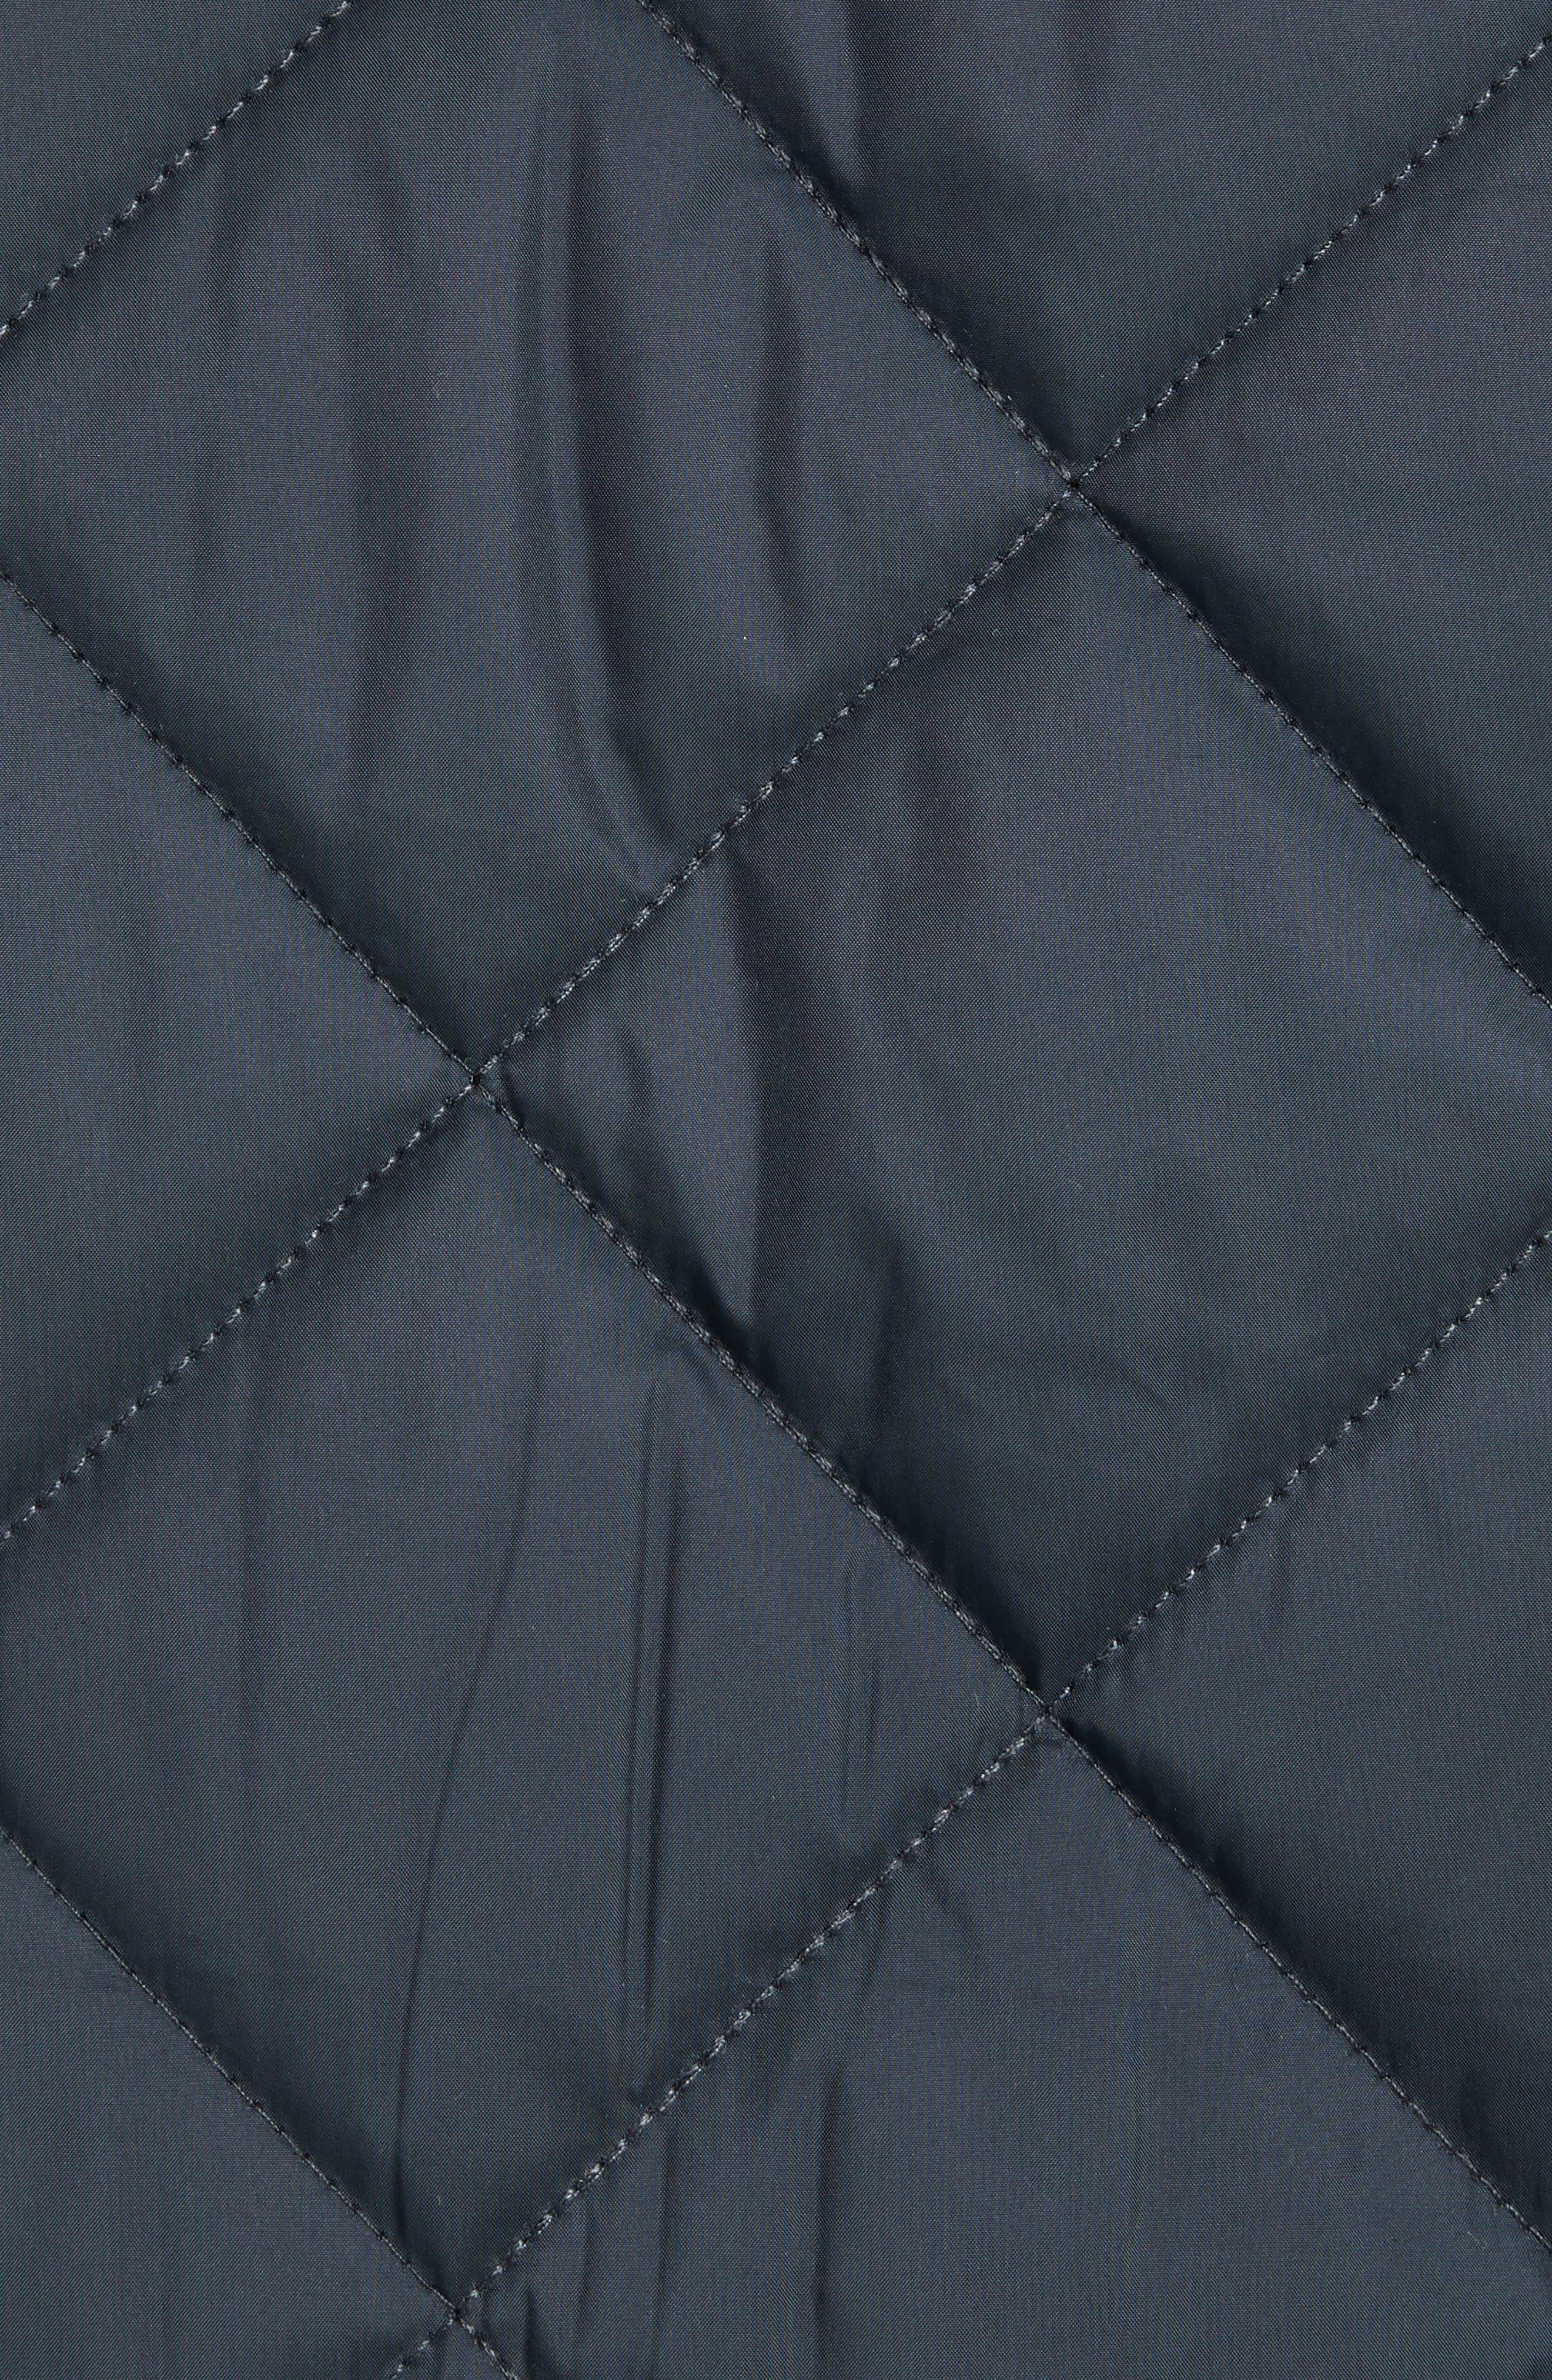 MARC NEW YORK, Humboldt Quilted Jacket, Alternate thumbnail 7, color, BLACK